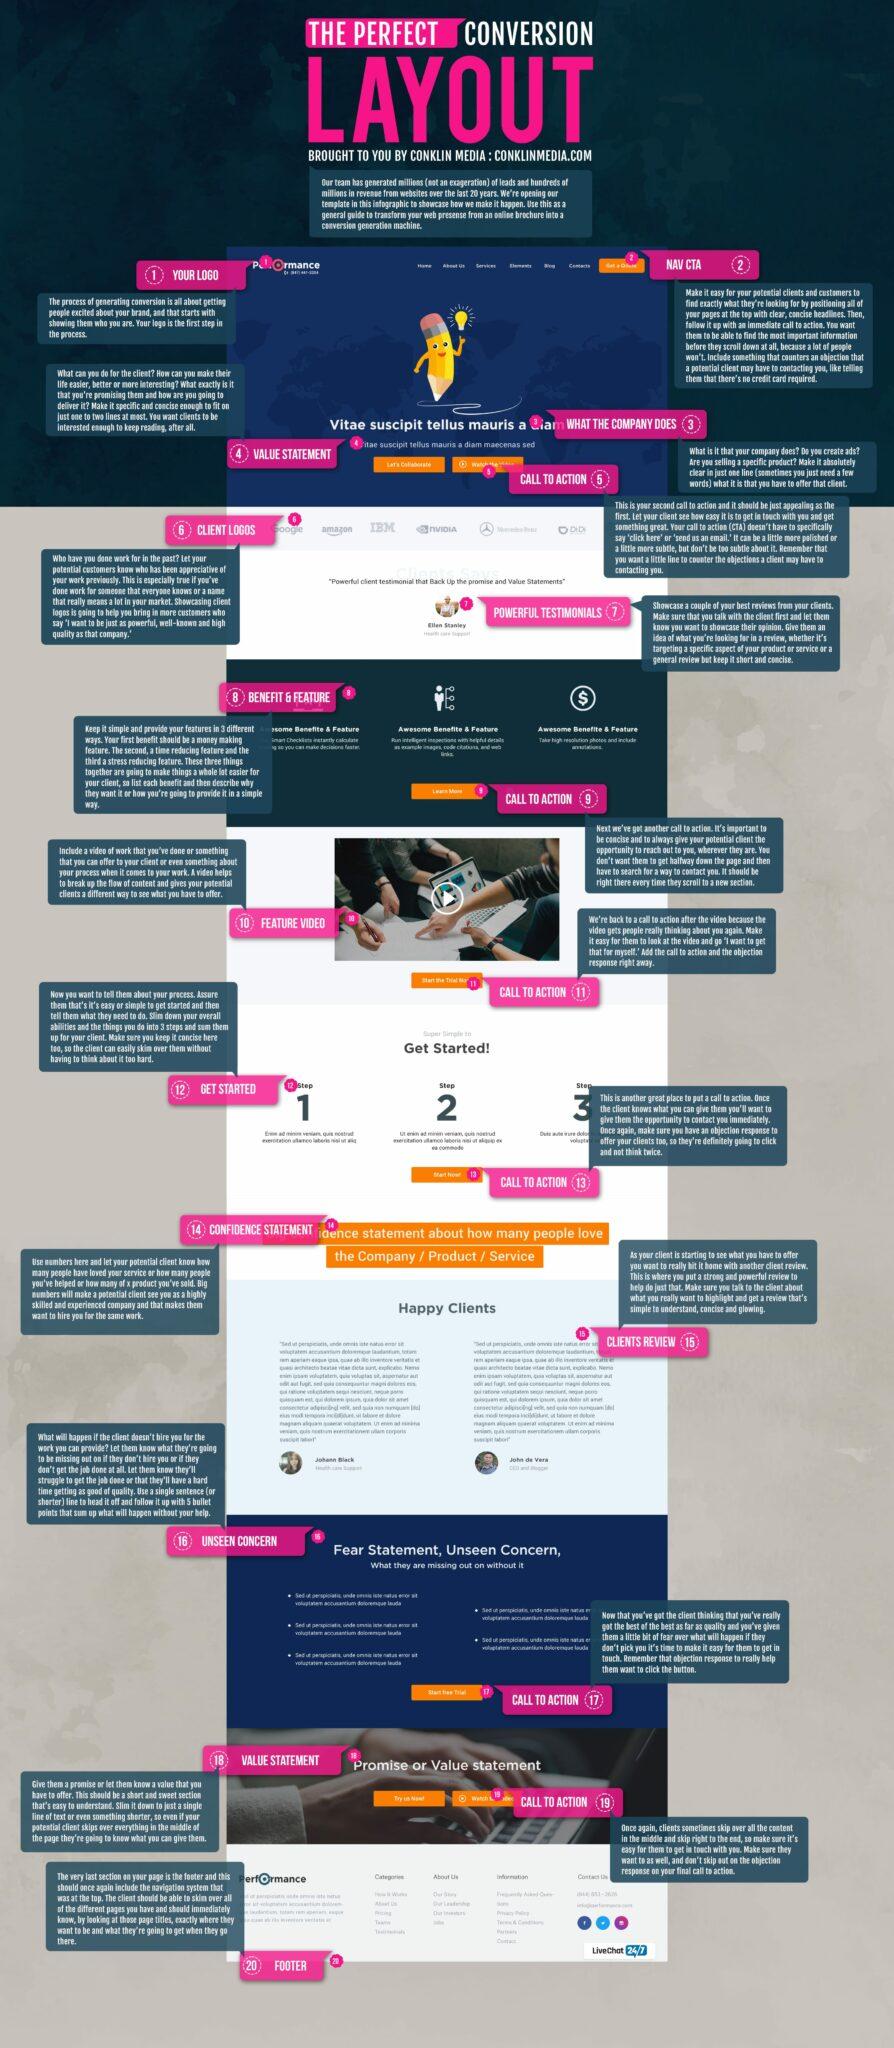 web design infographic conversion optimization